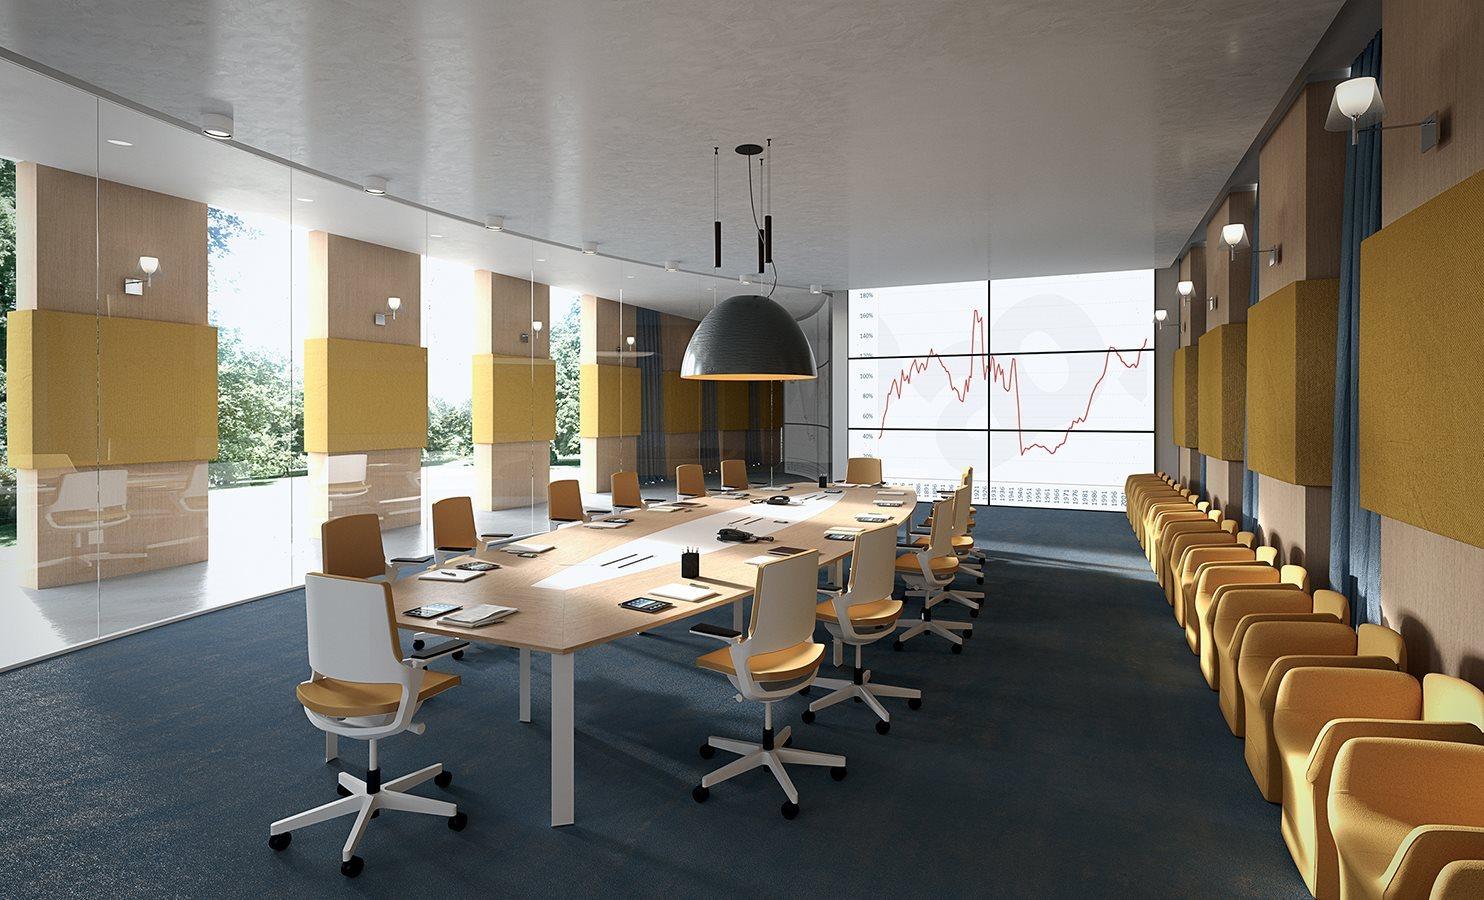 impromptu oval office meeting - 994×702